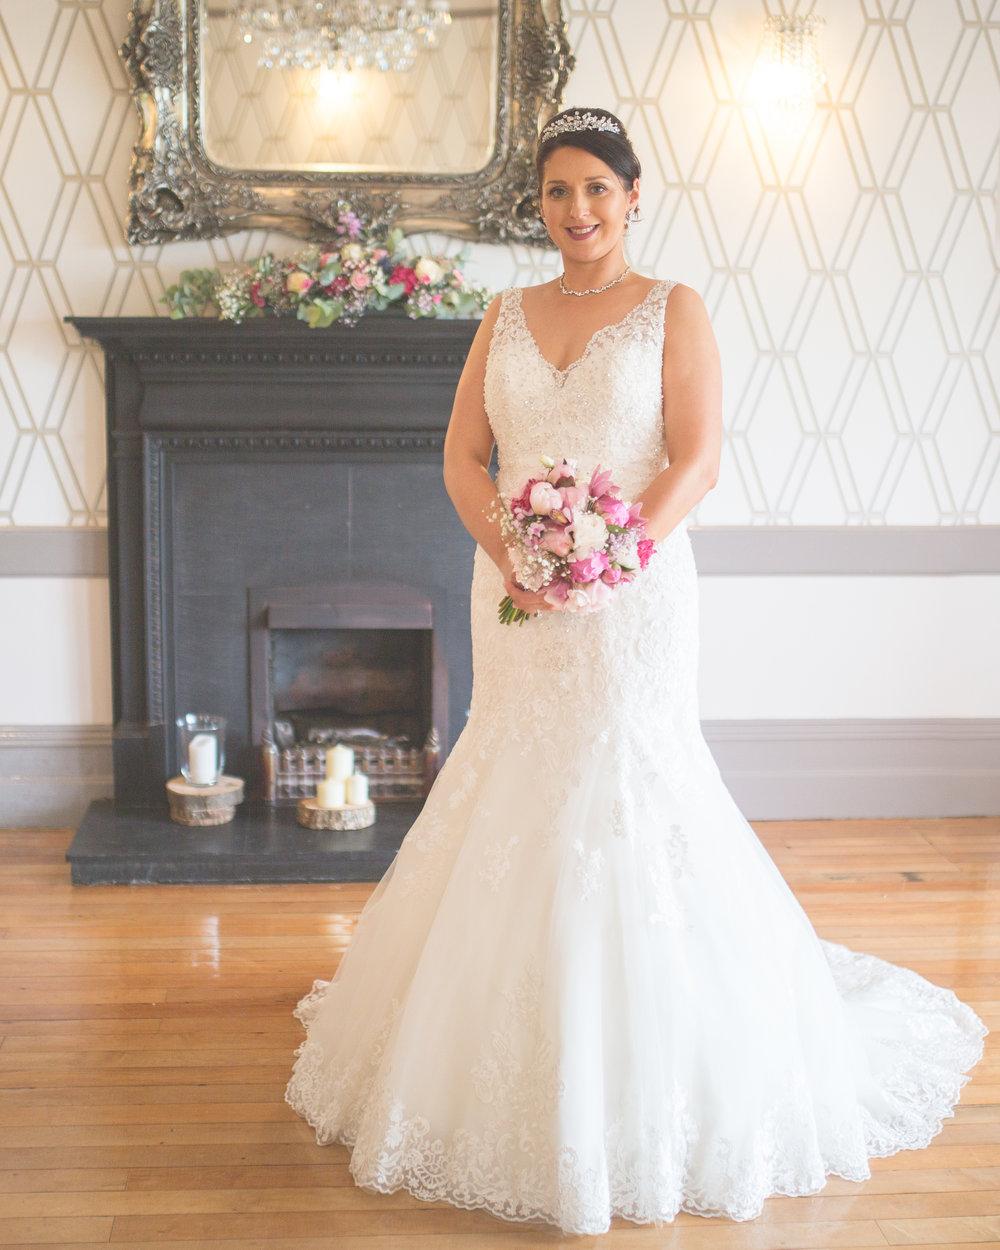 Northern Ireland Wedding Photographer | Brian McEwan | Louise & Darren-314.jpg